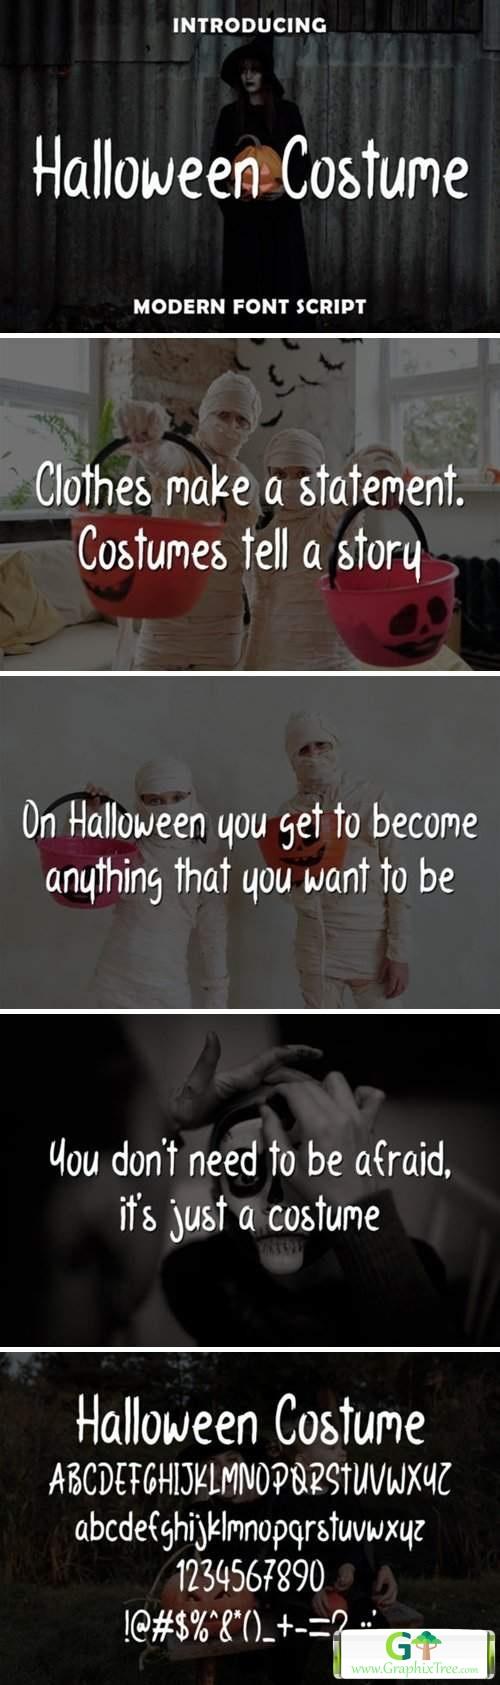 Halloween Costume [Font]